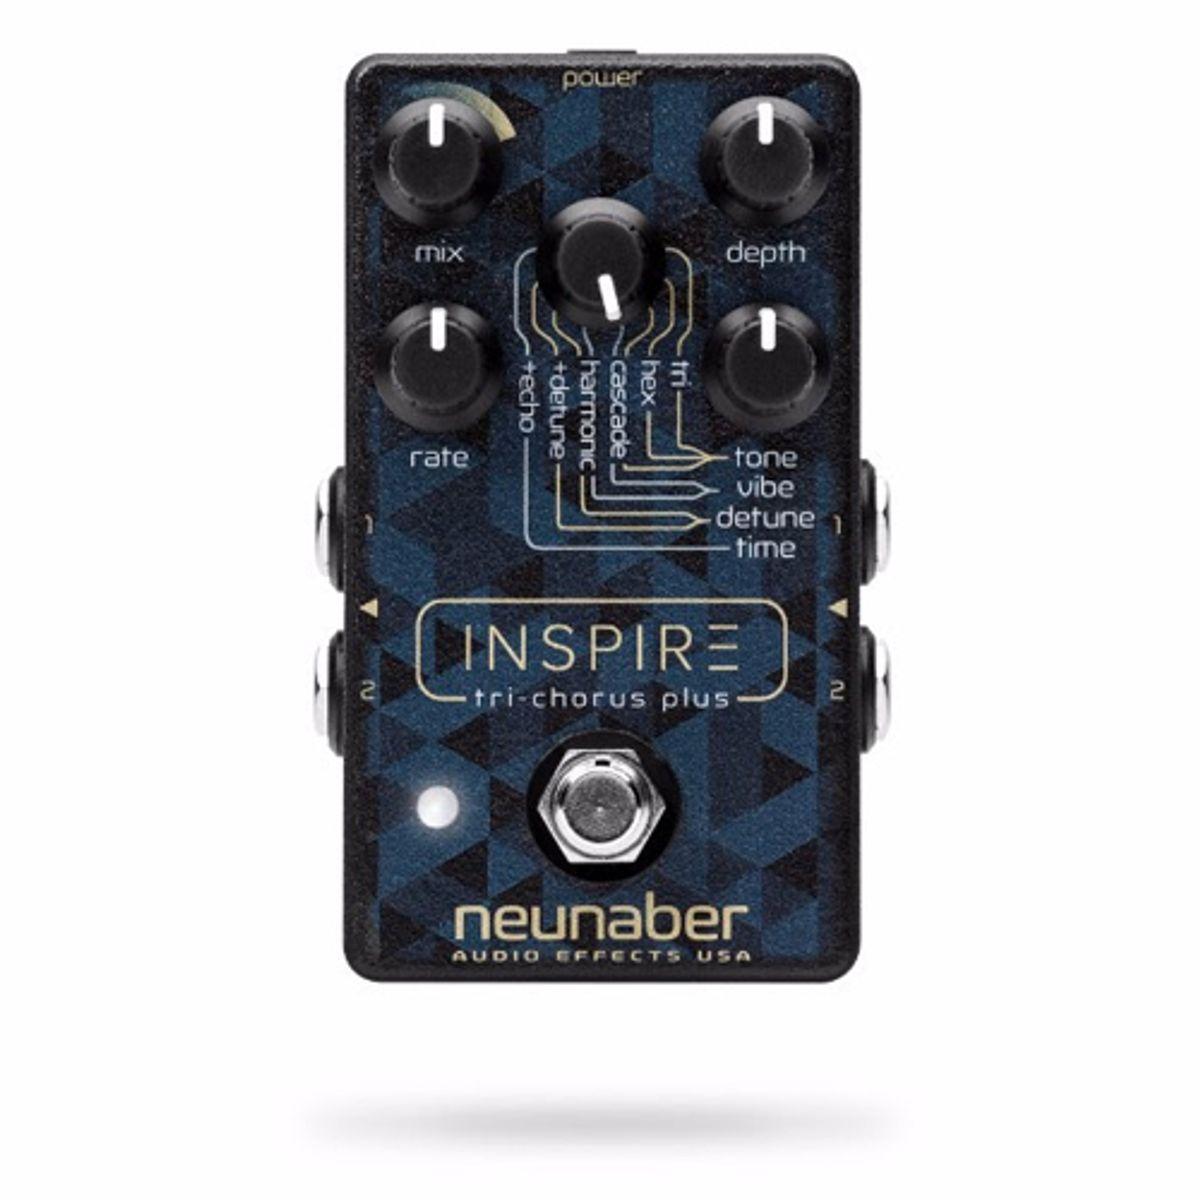 Neunaber Audio Effects Releases the Inspire Tri-Chorus Plus